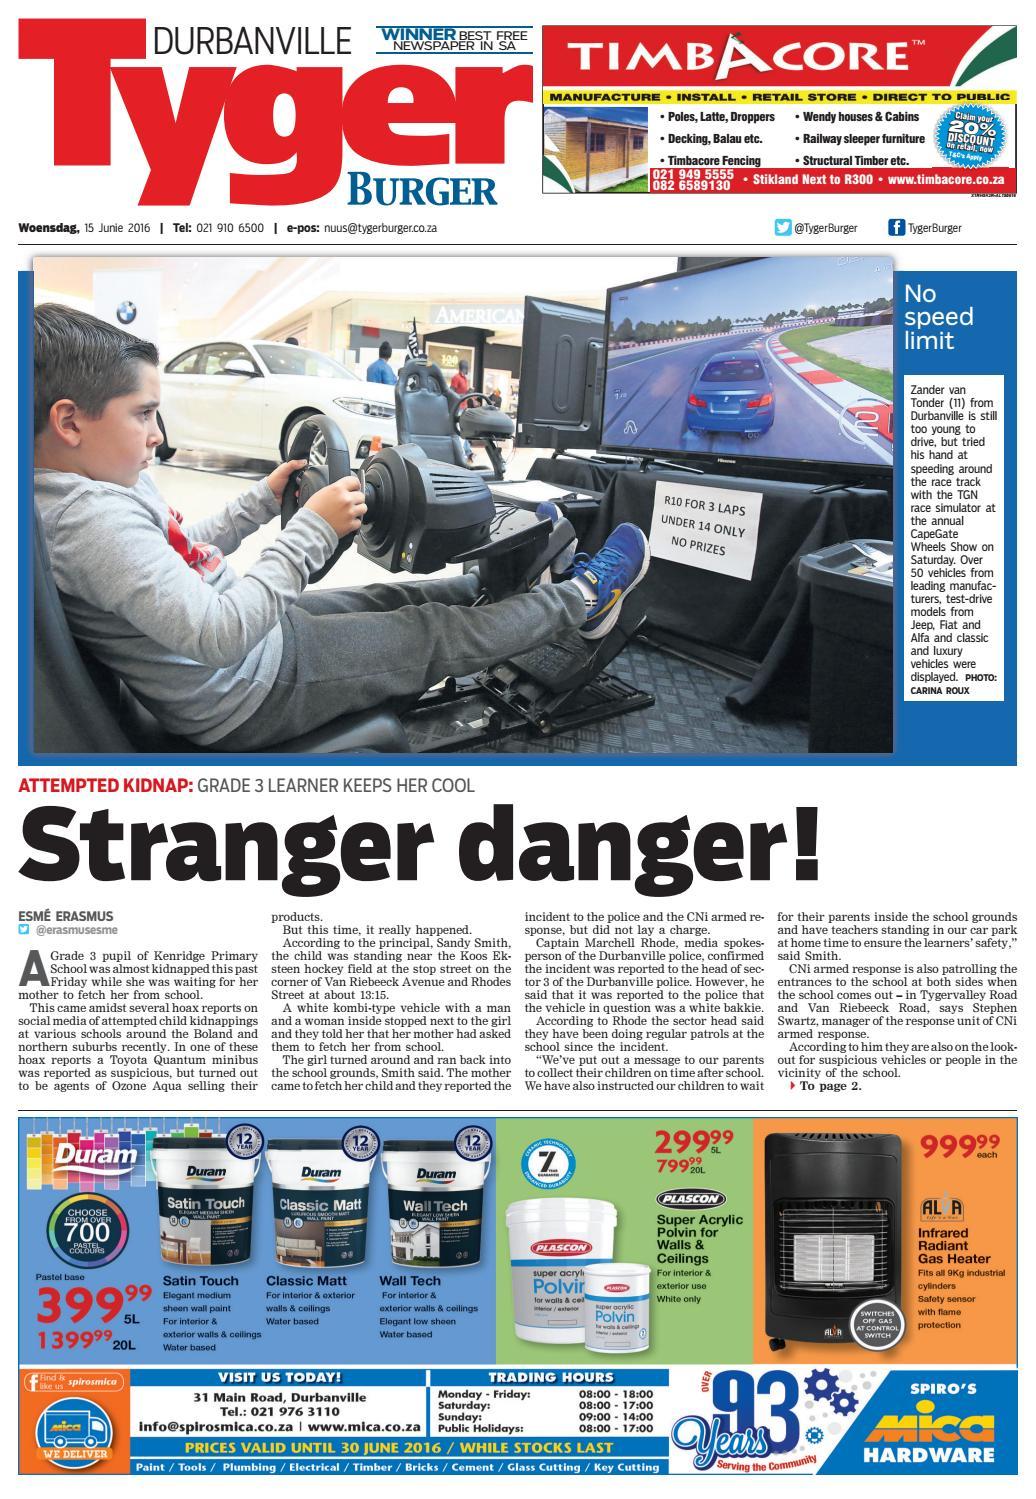 TygerBurger Durbanville 20160615 by Tygerburger Newspaper